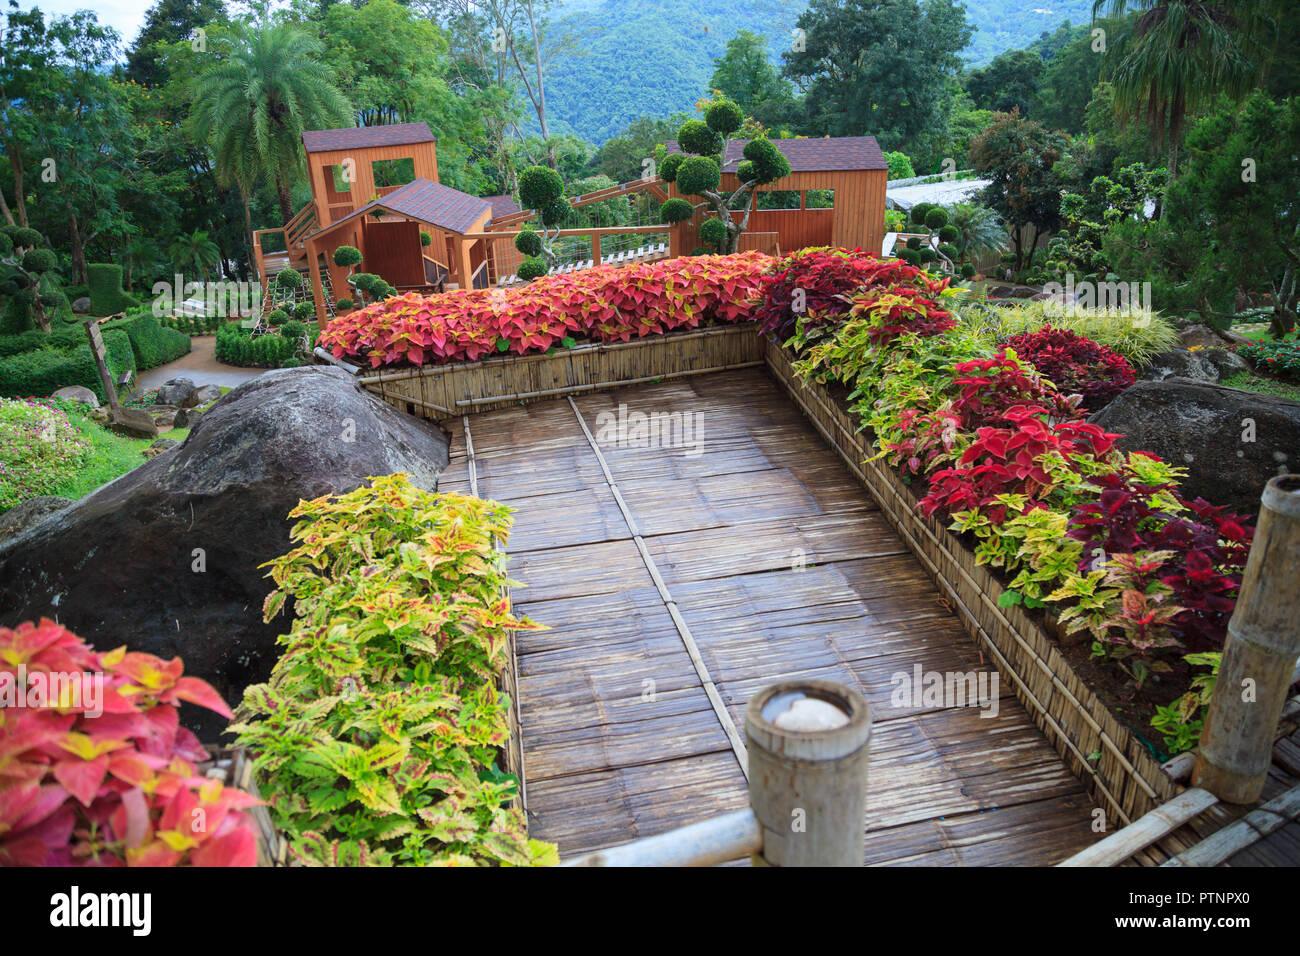 Maison rural tropicaux accueil jardin balcon terrasse en ...